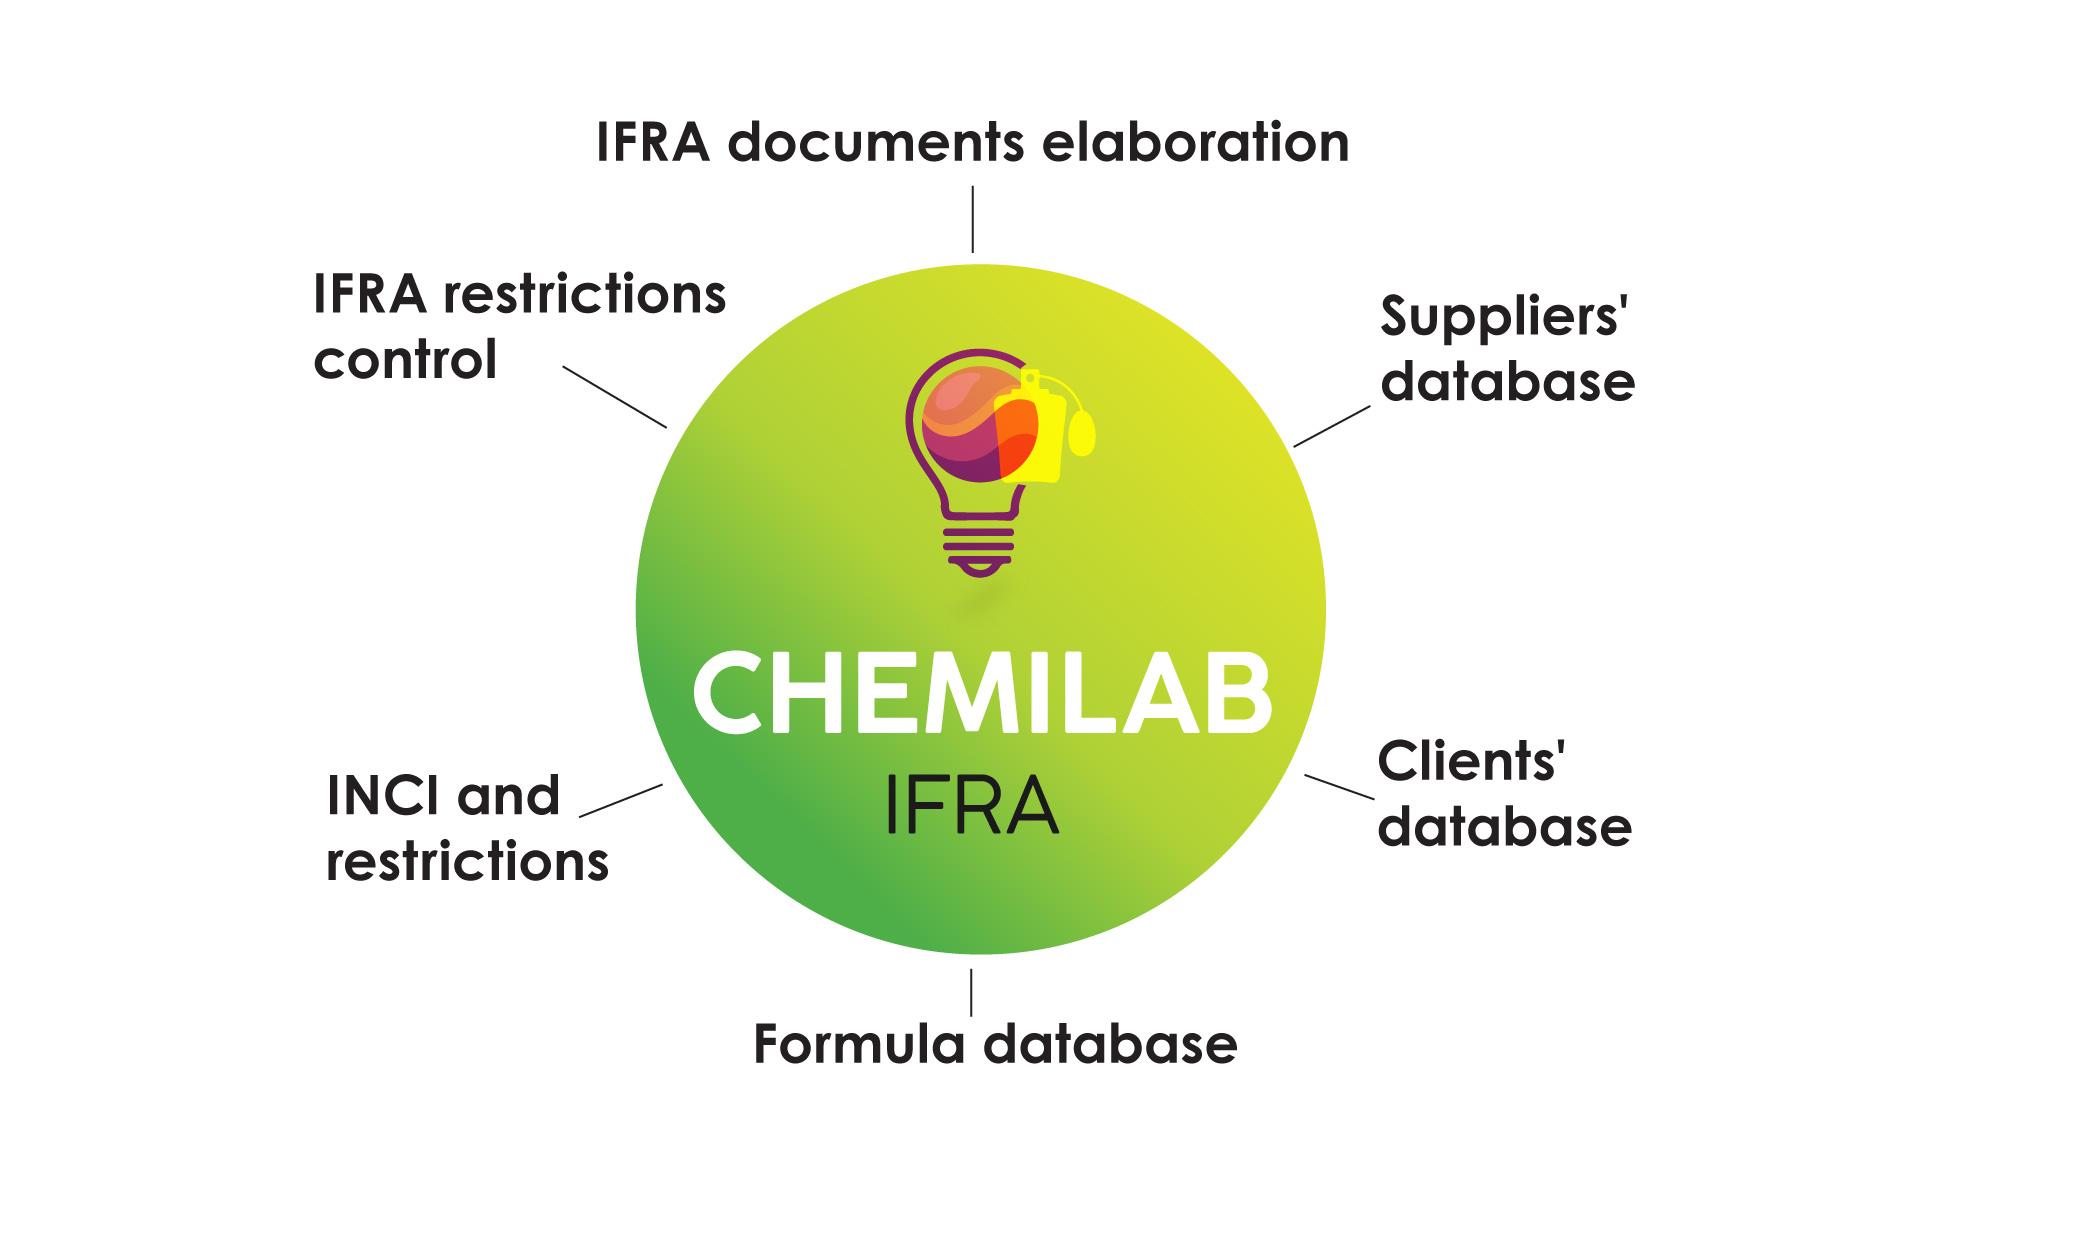 chemilab ifra